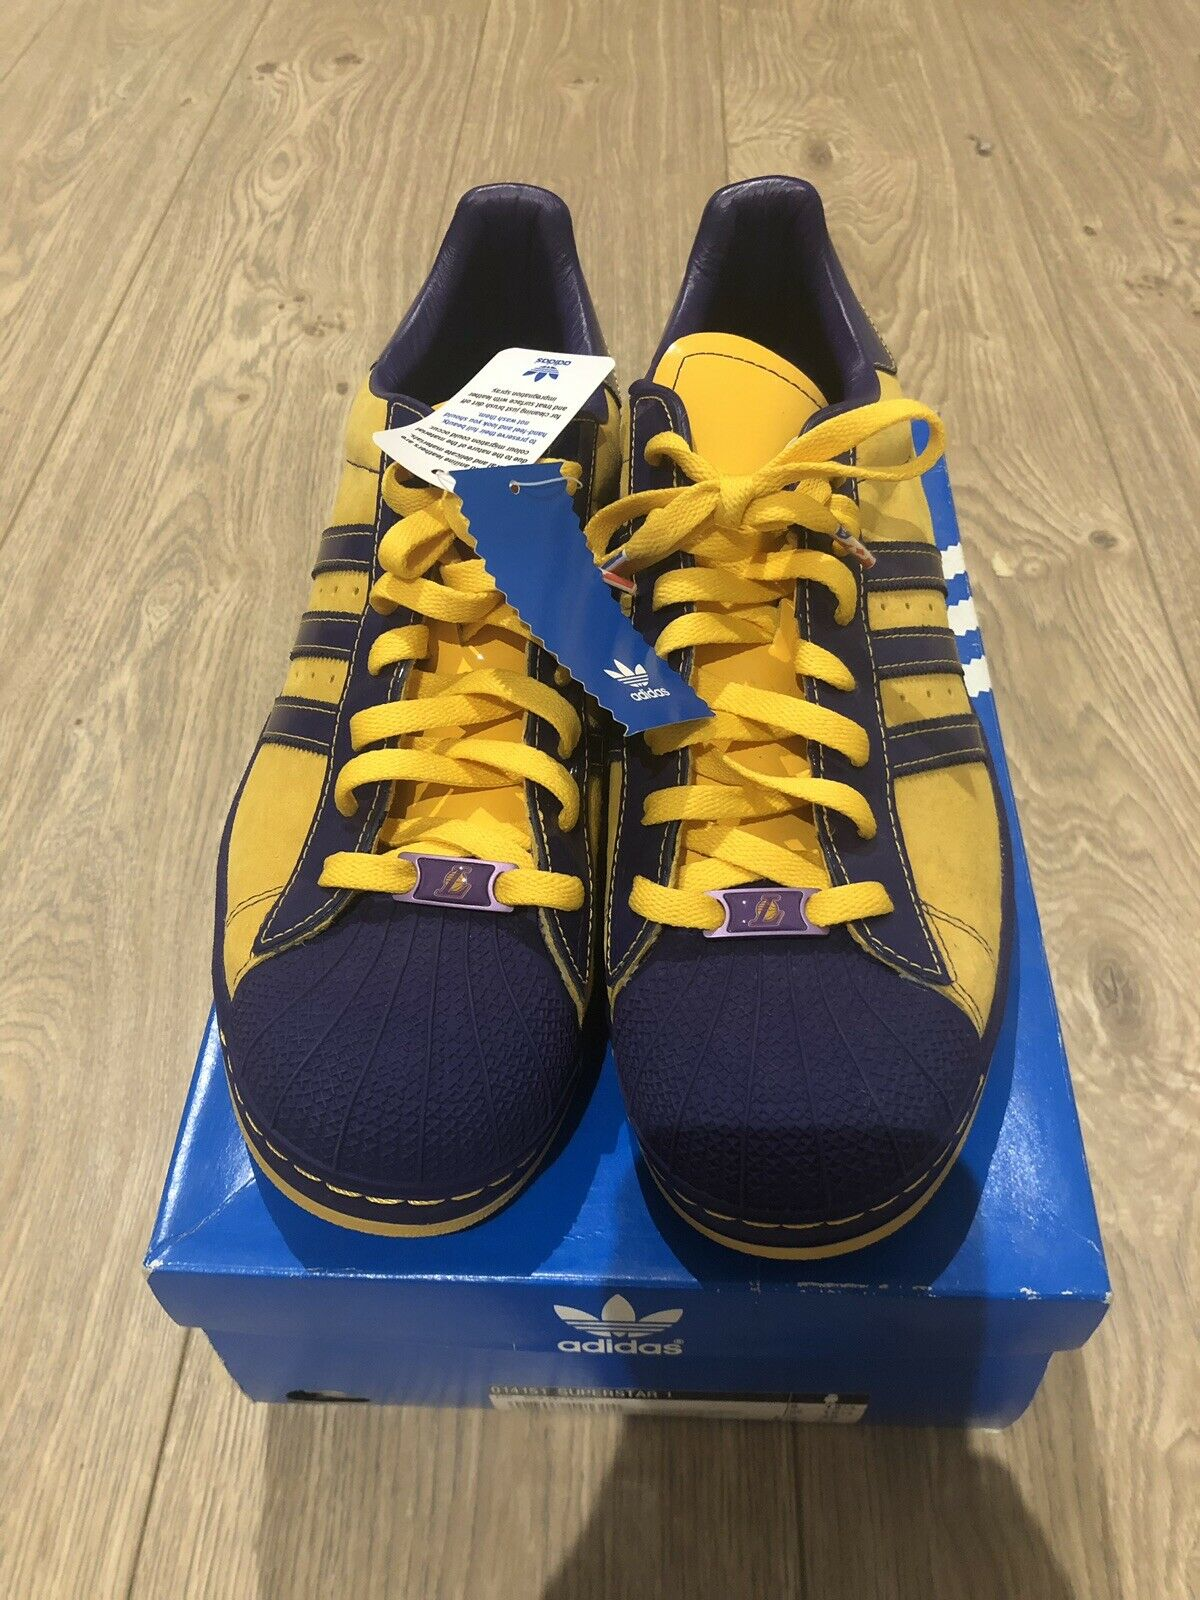 Rare Adidas Superstar1 NBA LA Lakers